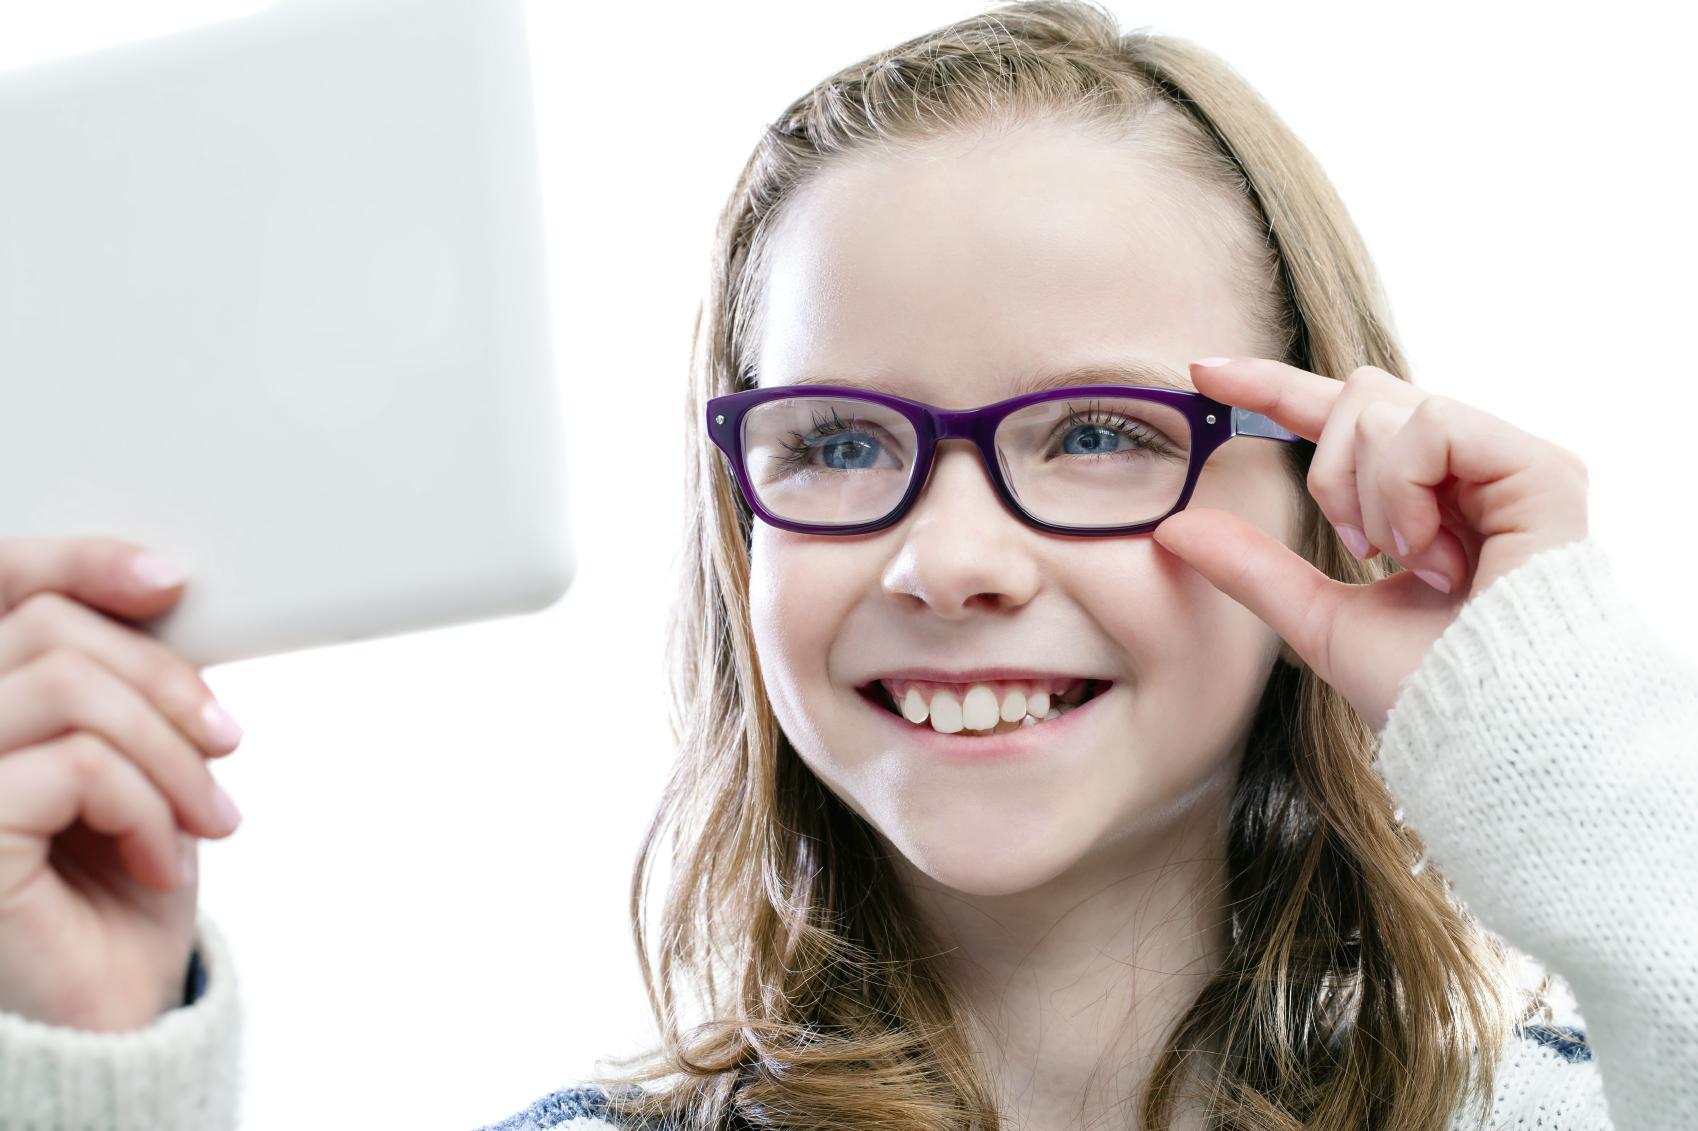 Niña rubia probándose unas gafas moradas